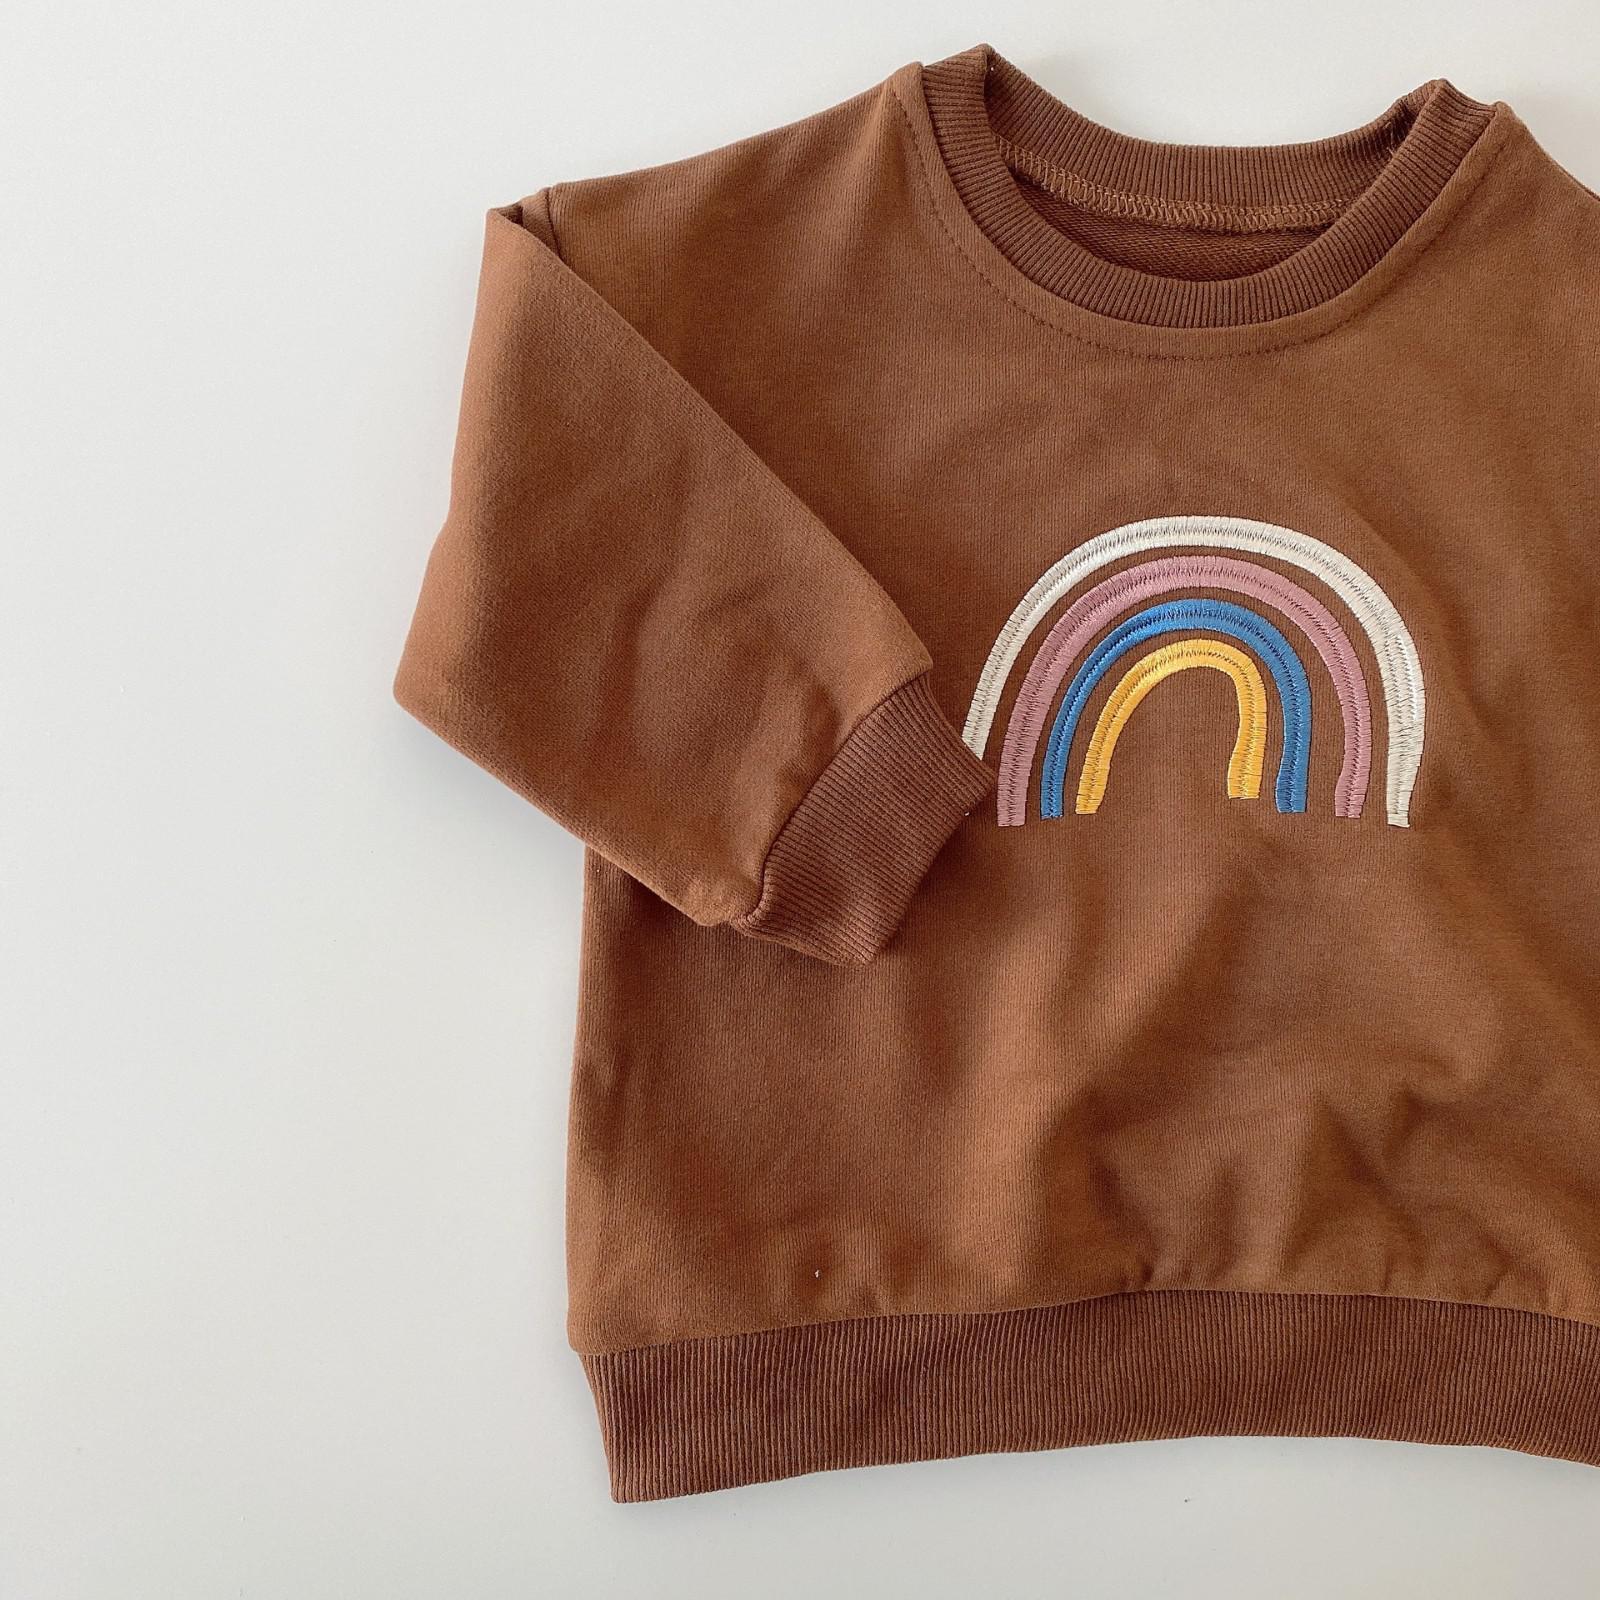 Autumn Baby Girls Embroidery Rainbow Sweatshirts Long Sleeve Tops Kids Toddler Boys Pullover Sweatshirt Rainbow T-shirt Clothes 9